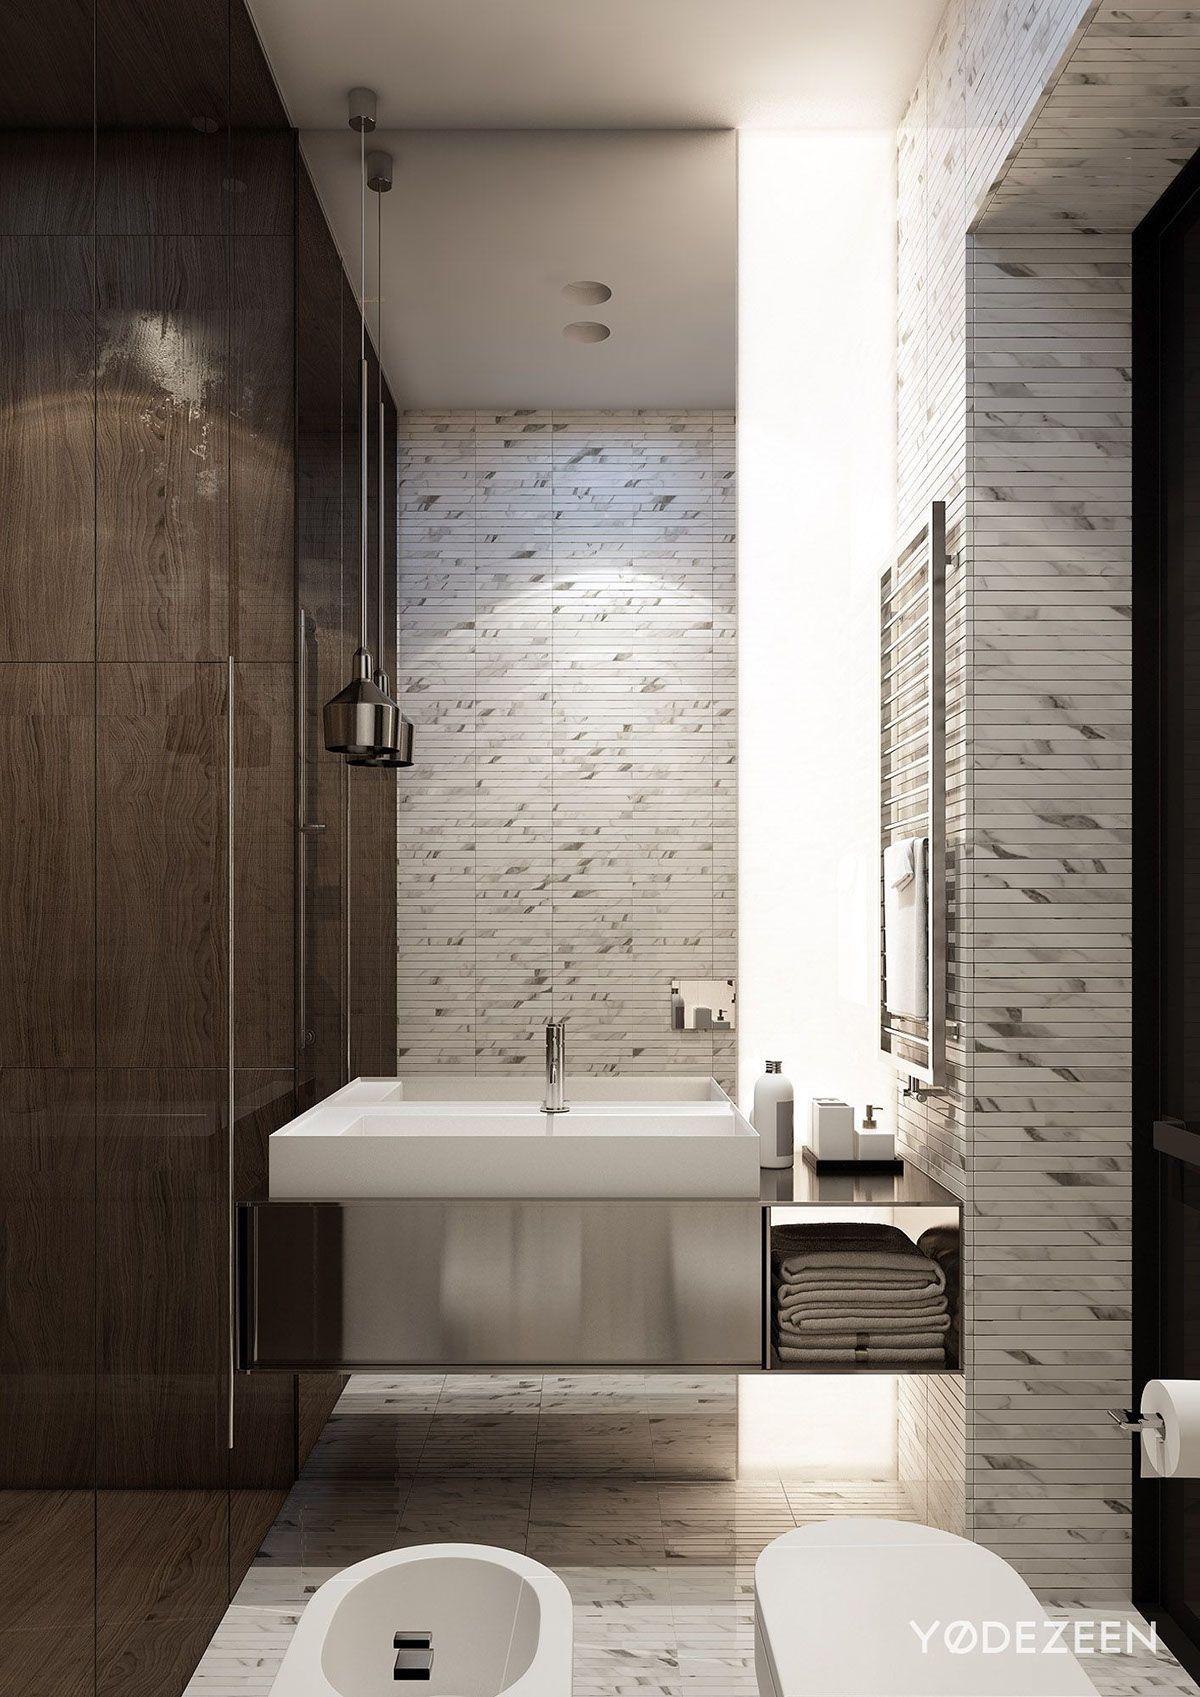 Residence in Baku on Behance Bathroom DesignsToiletInteriorHousePowder